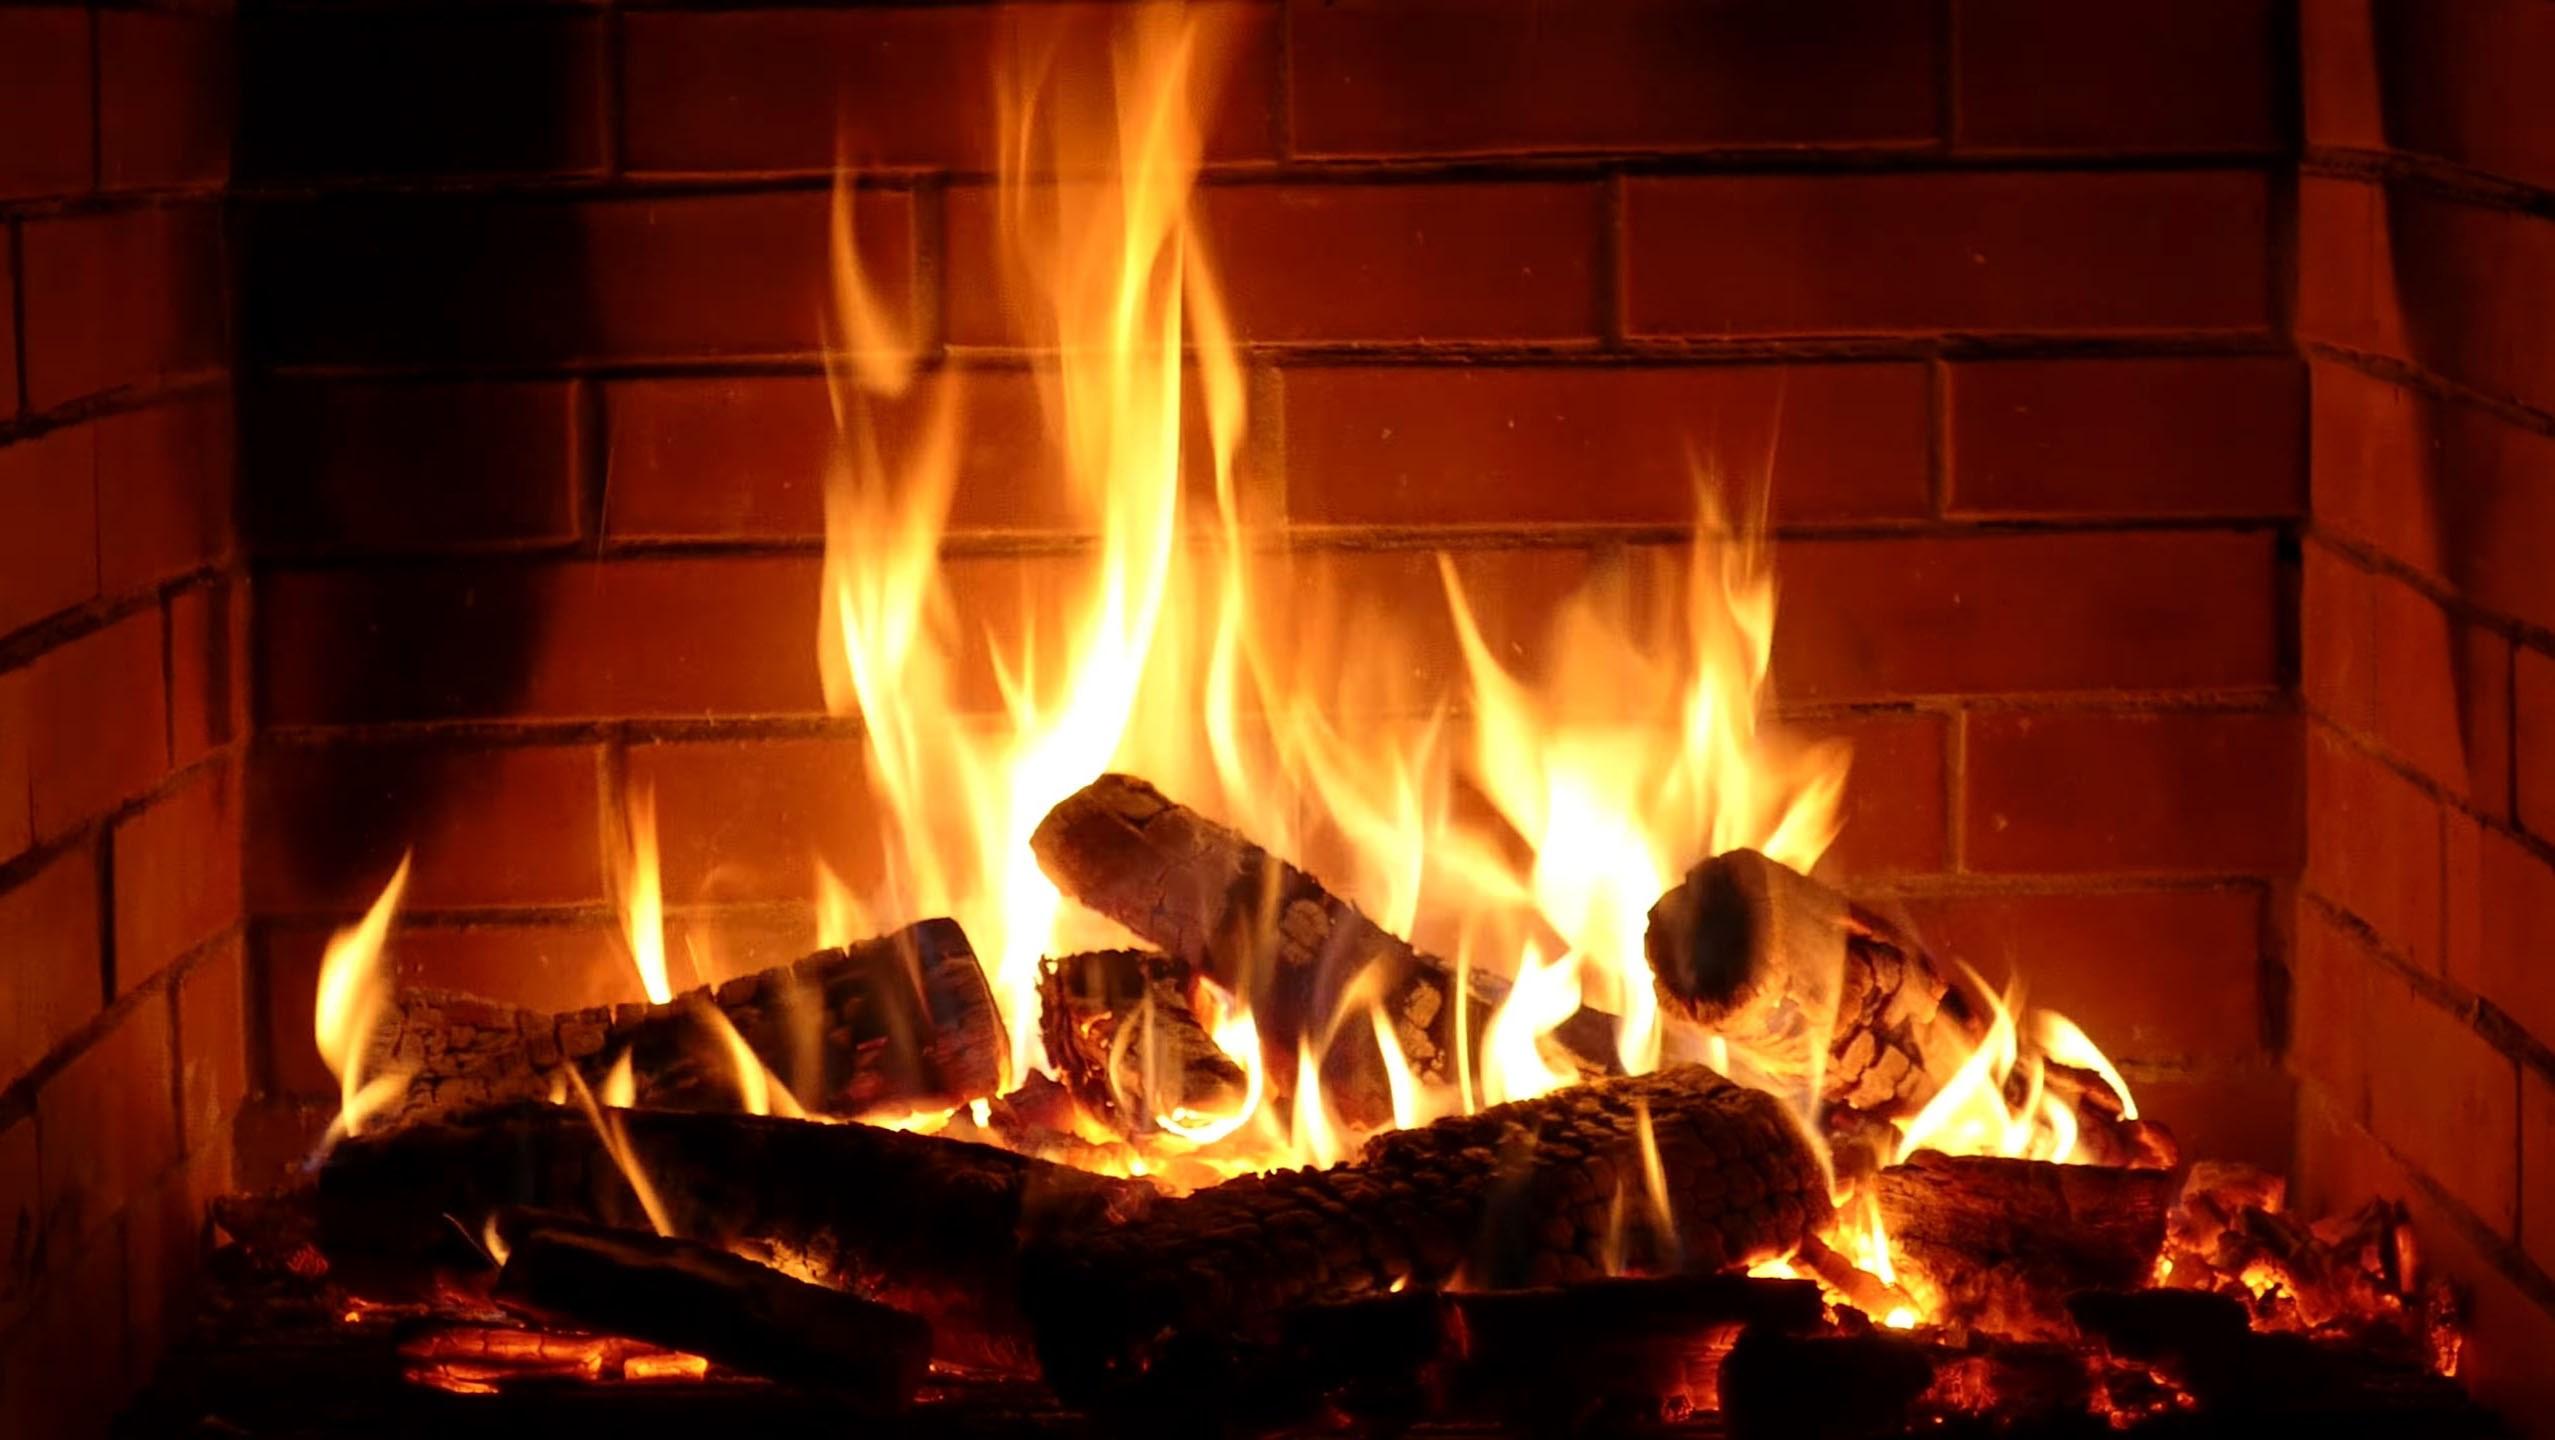 fireplace firewood flicker flame christmas - HD2555×1440